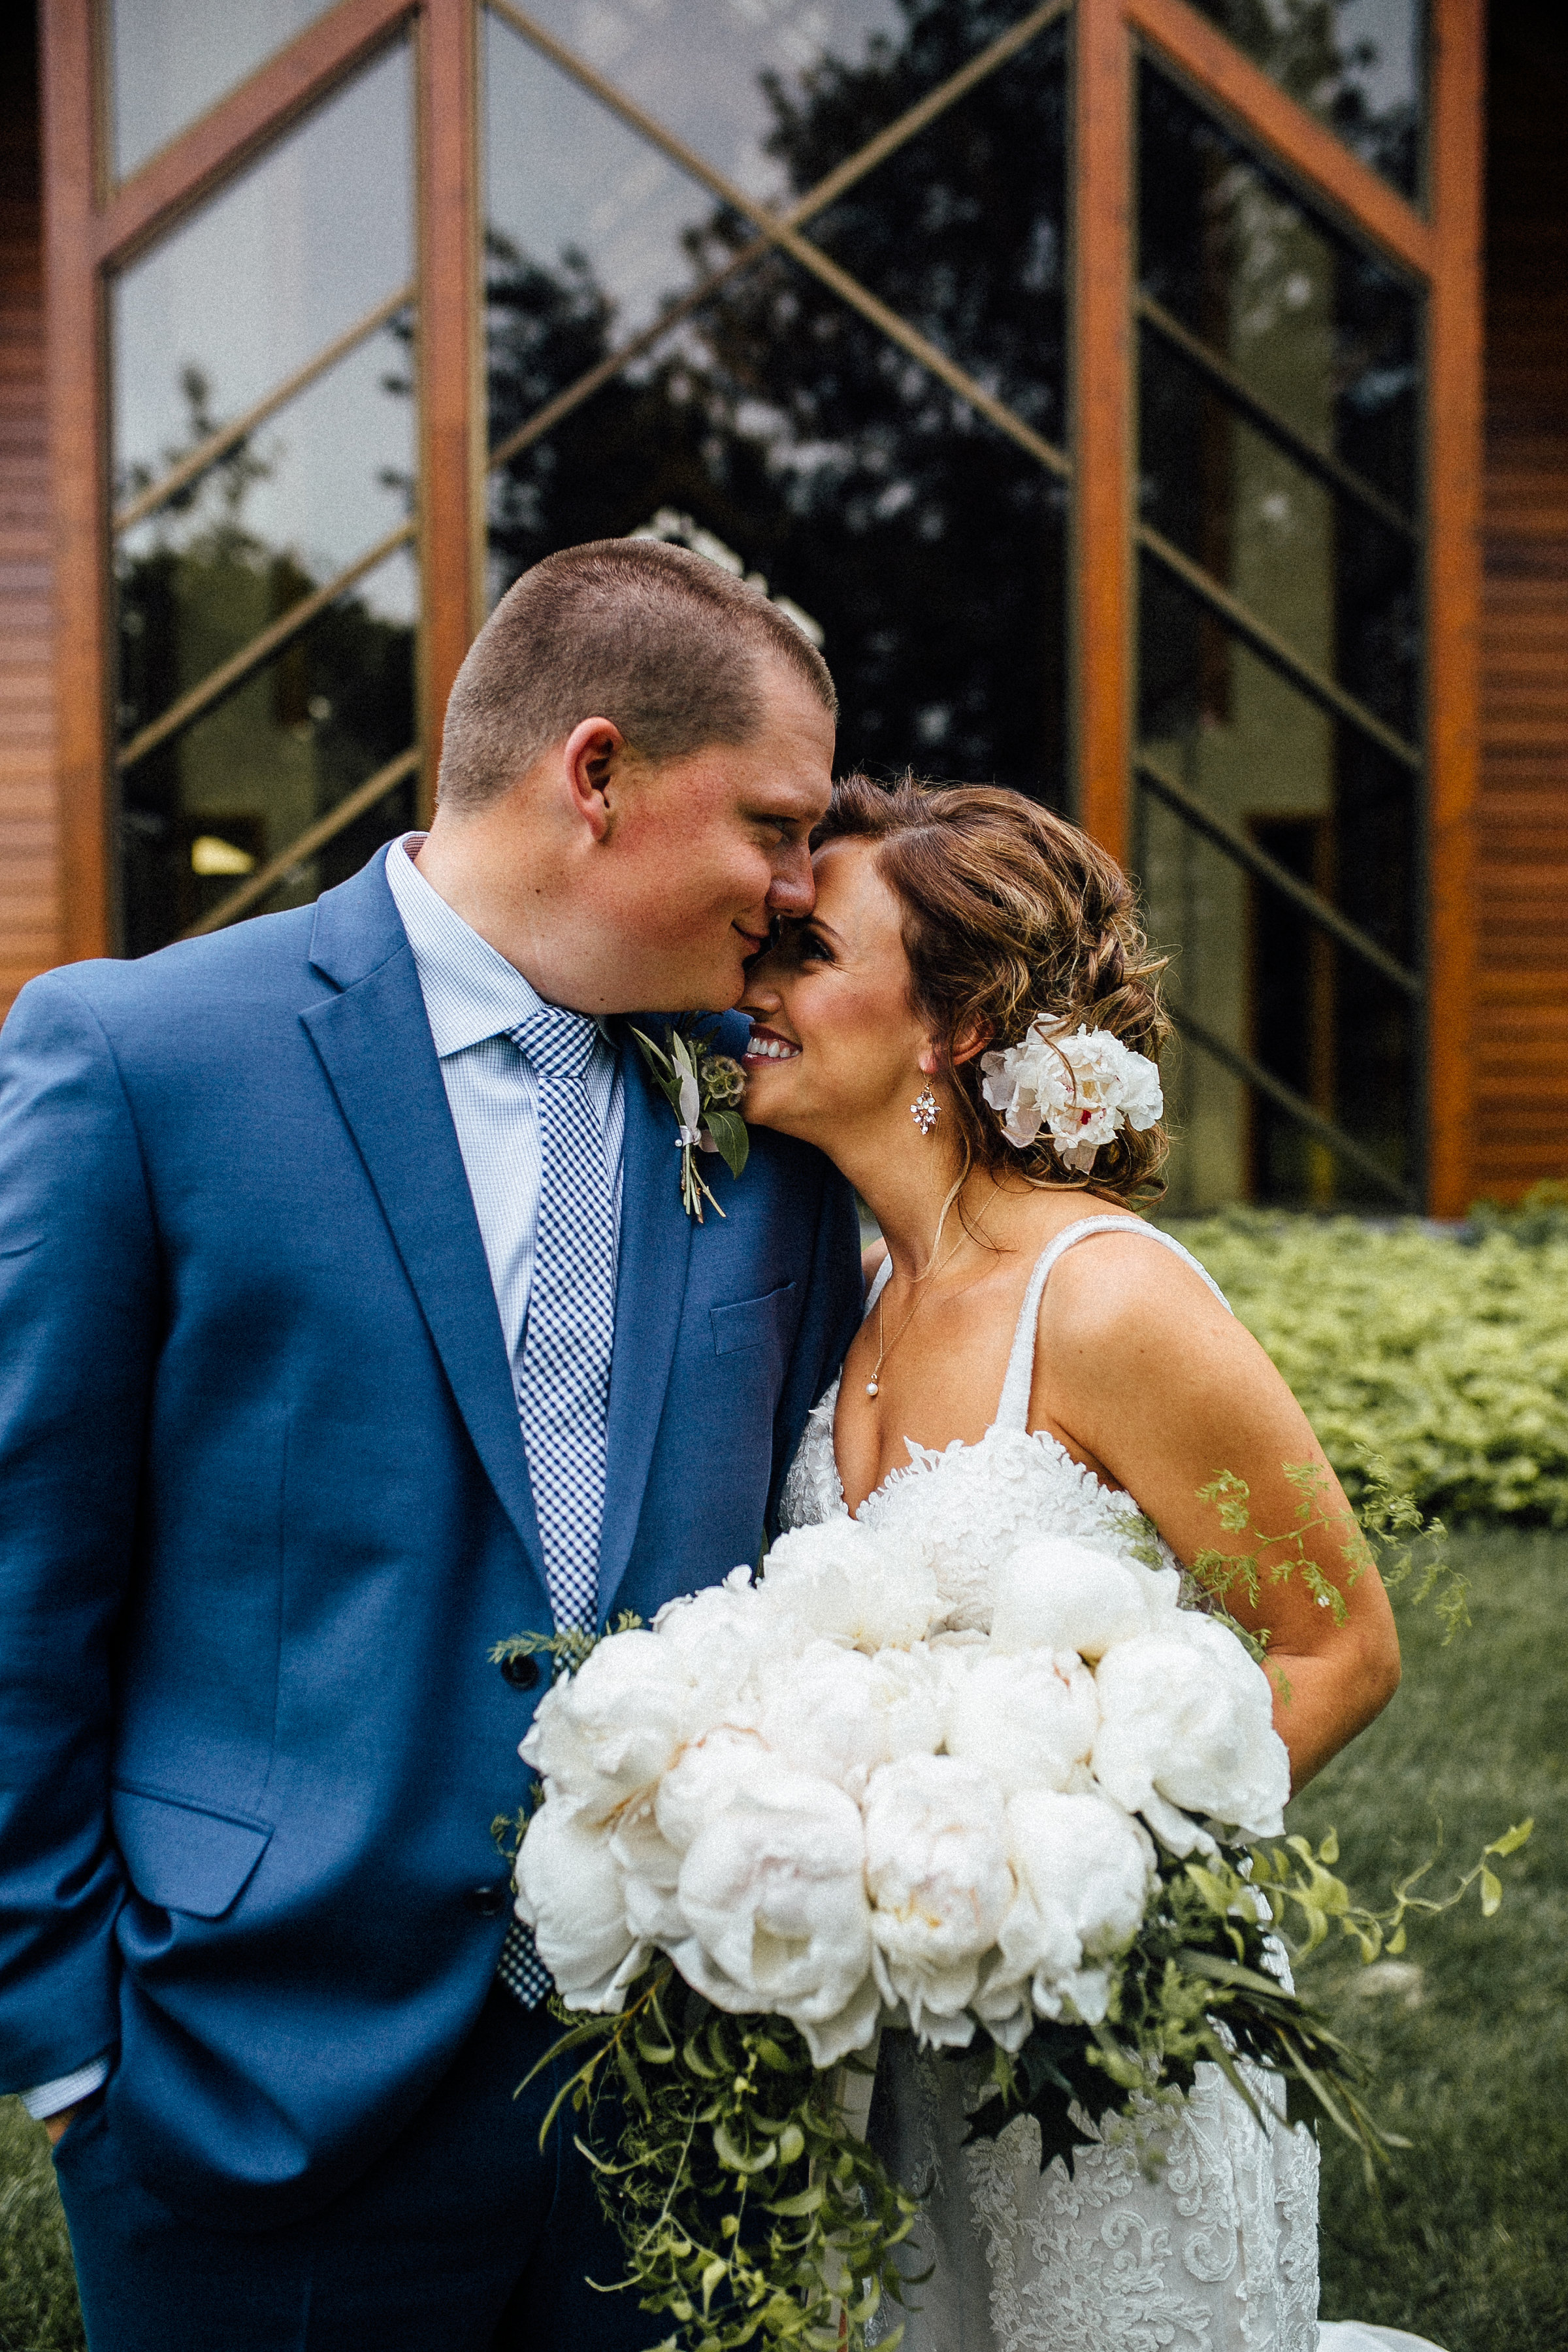 Whitney-Kevin-Portraits-Michigan-Wedding-Photographer-7.jpg